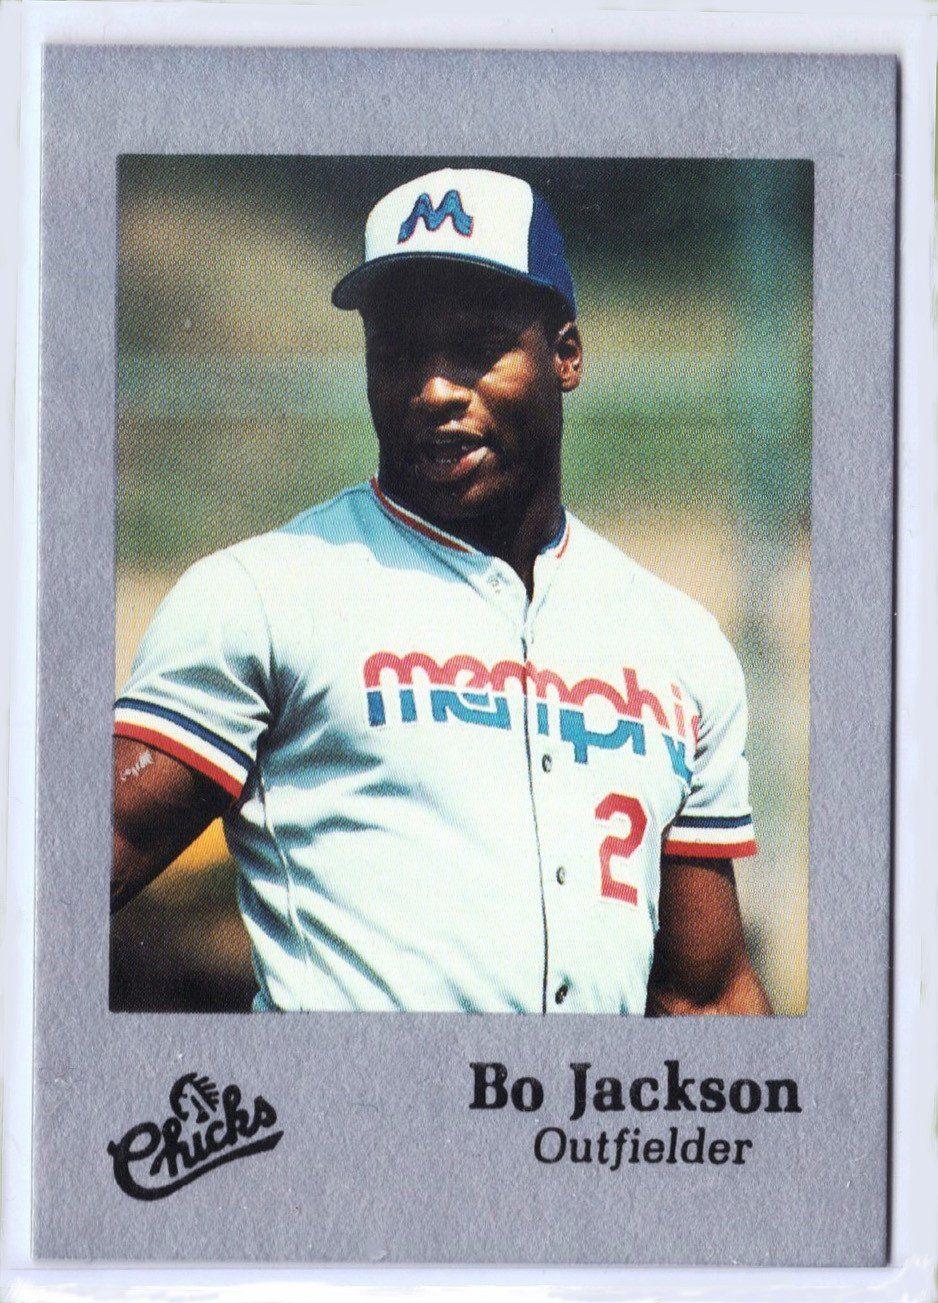 1986 bo jackson rare early minors rookie card memphis